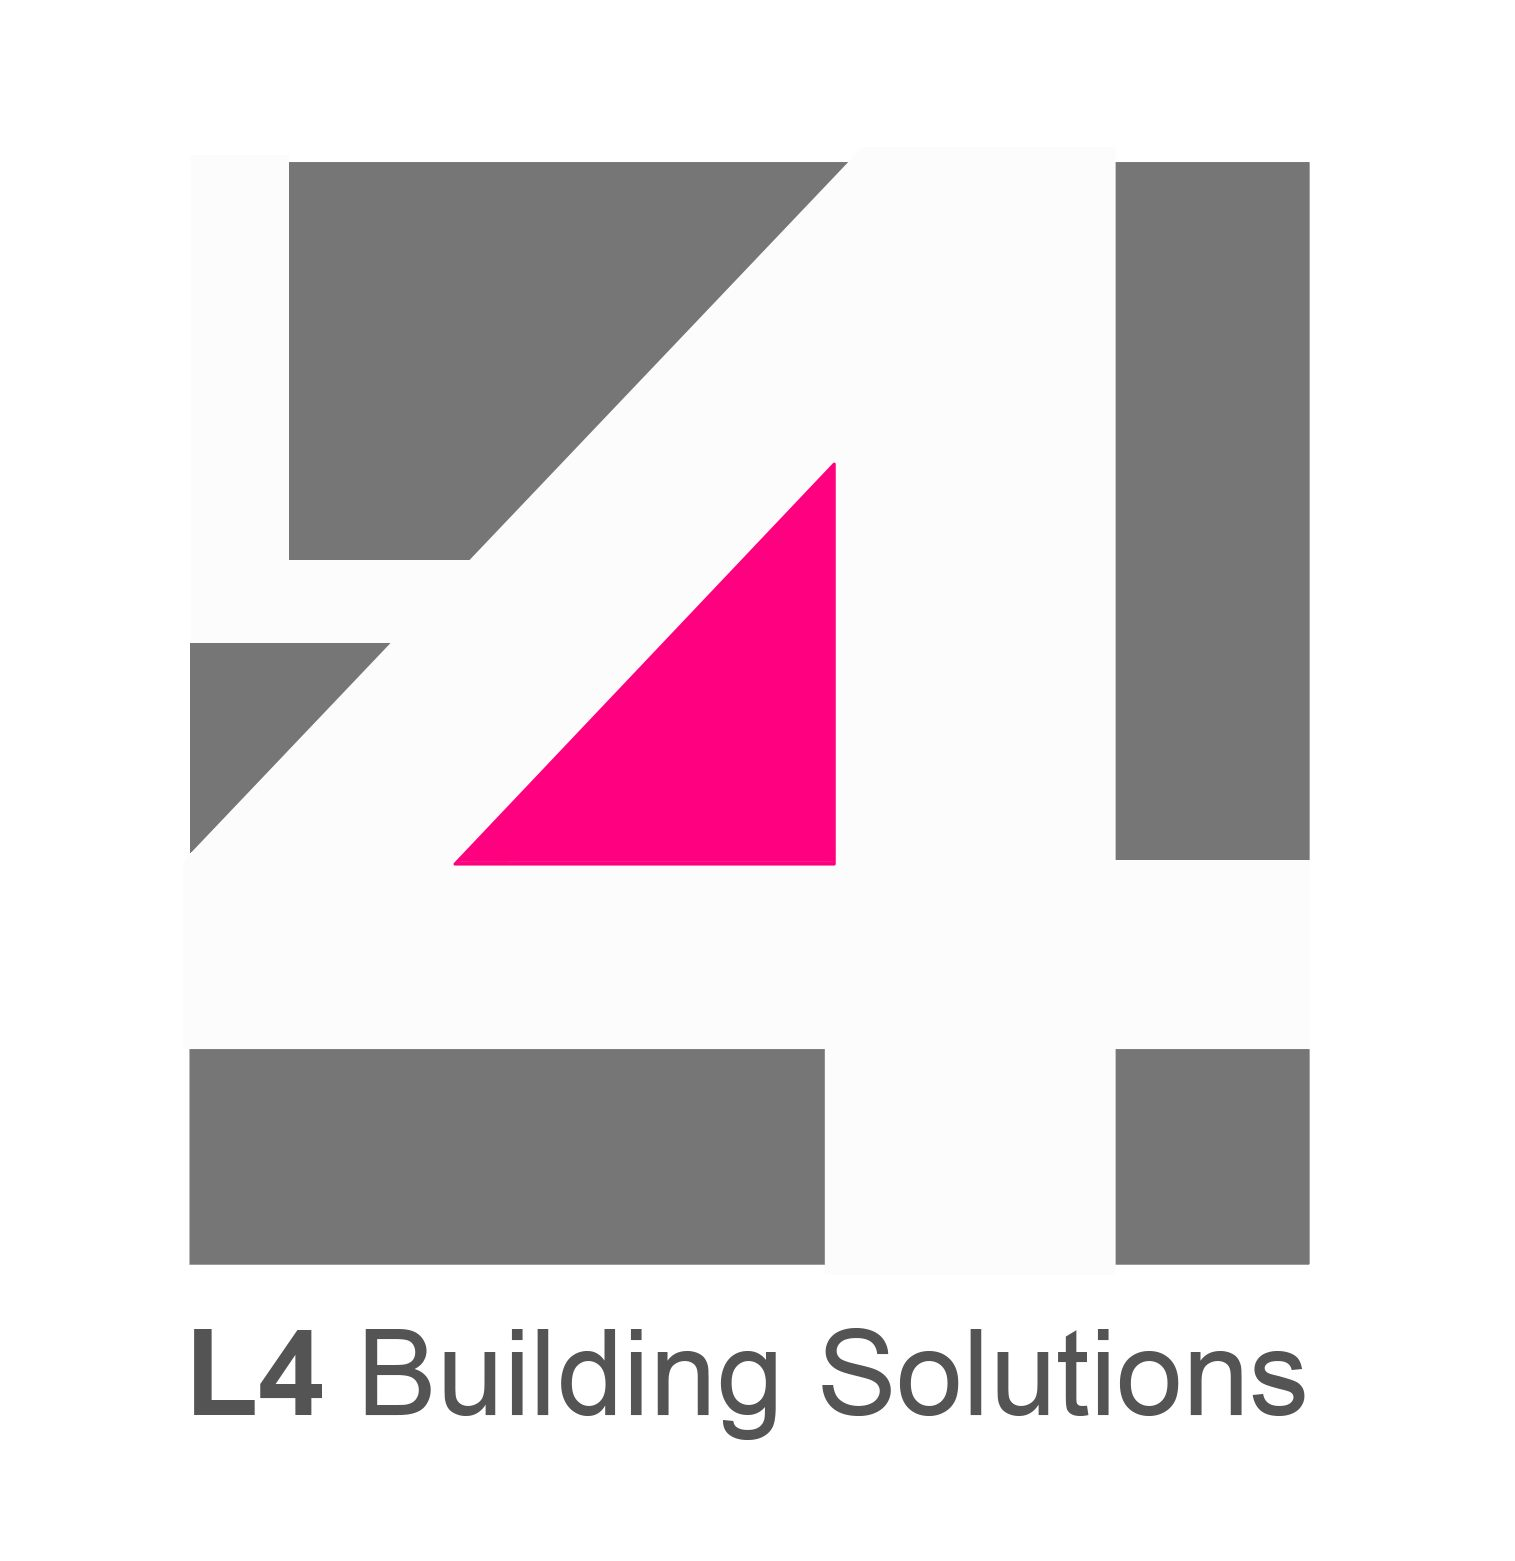 L4 Building Solutions